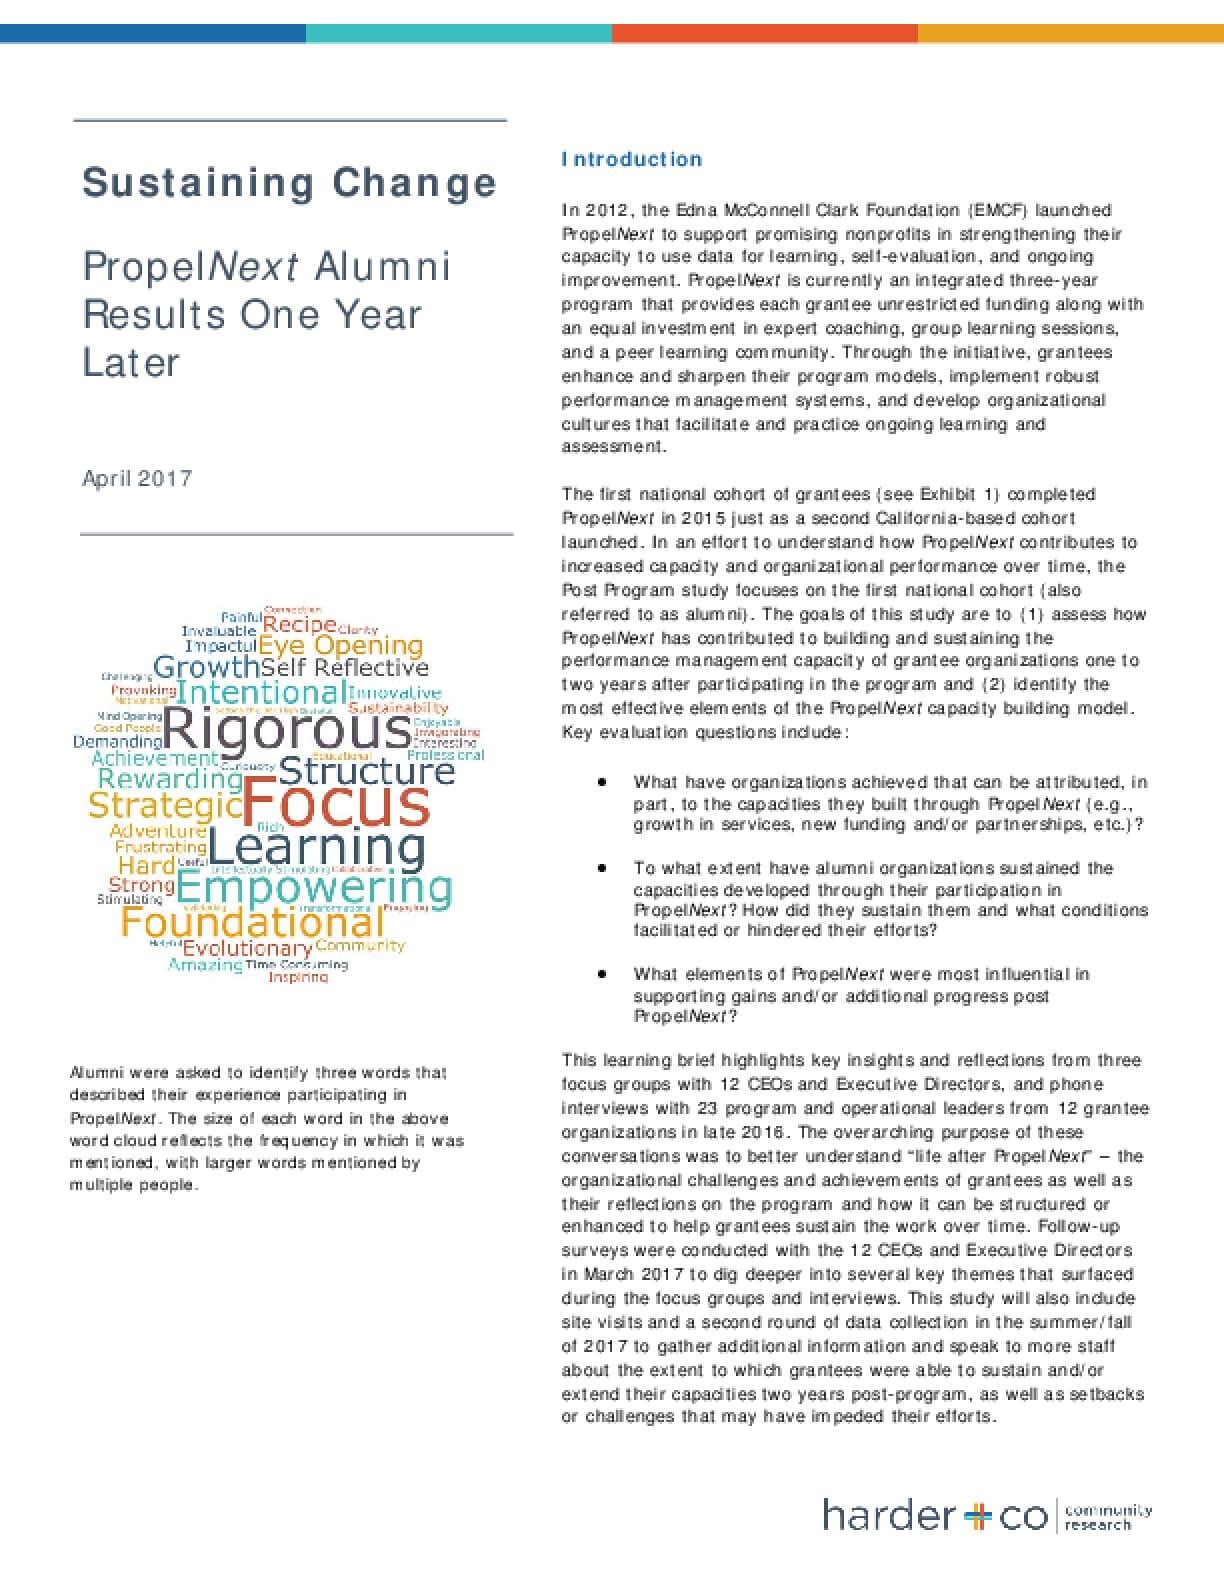 Sustaining Change: PropelNext Alumni Results One Year Later